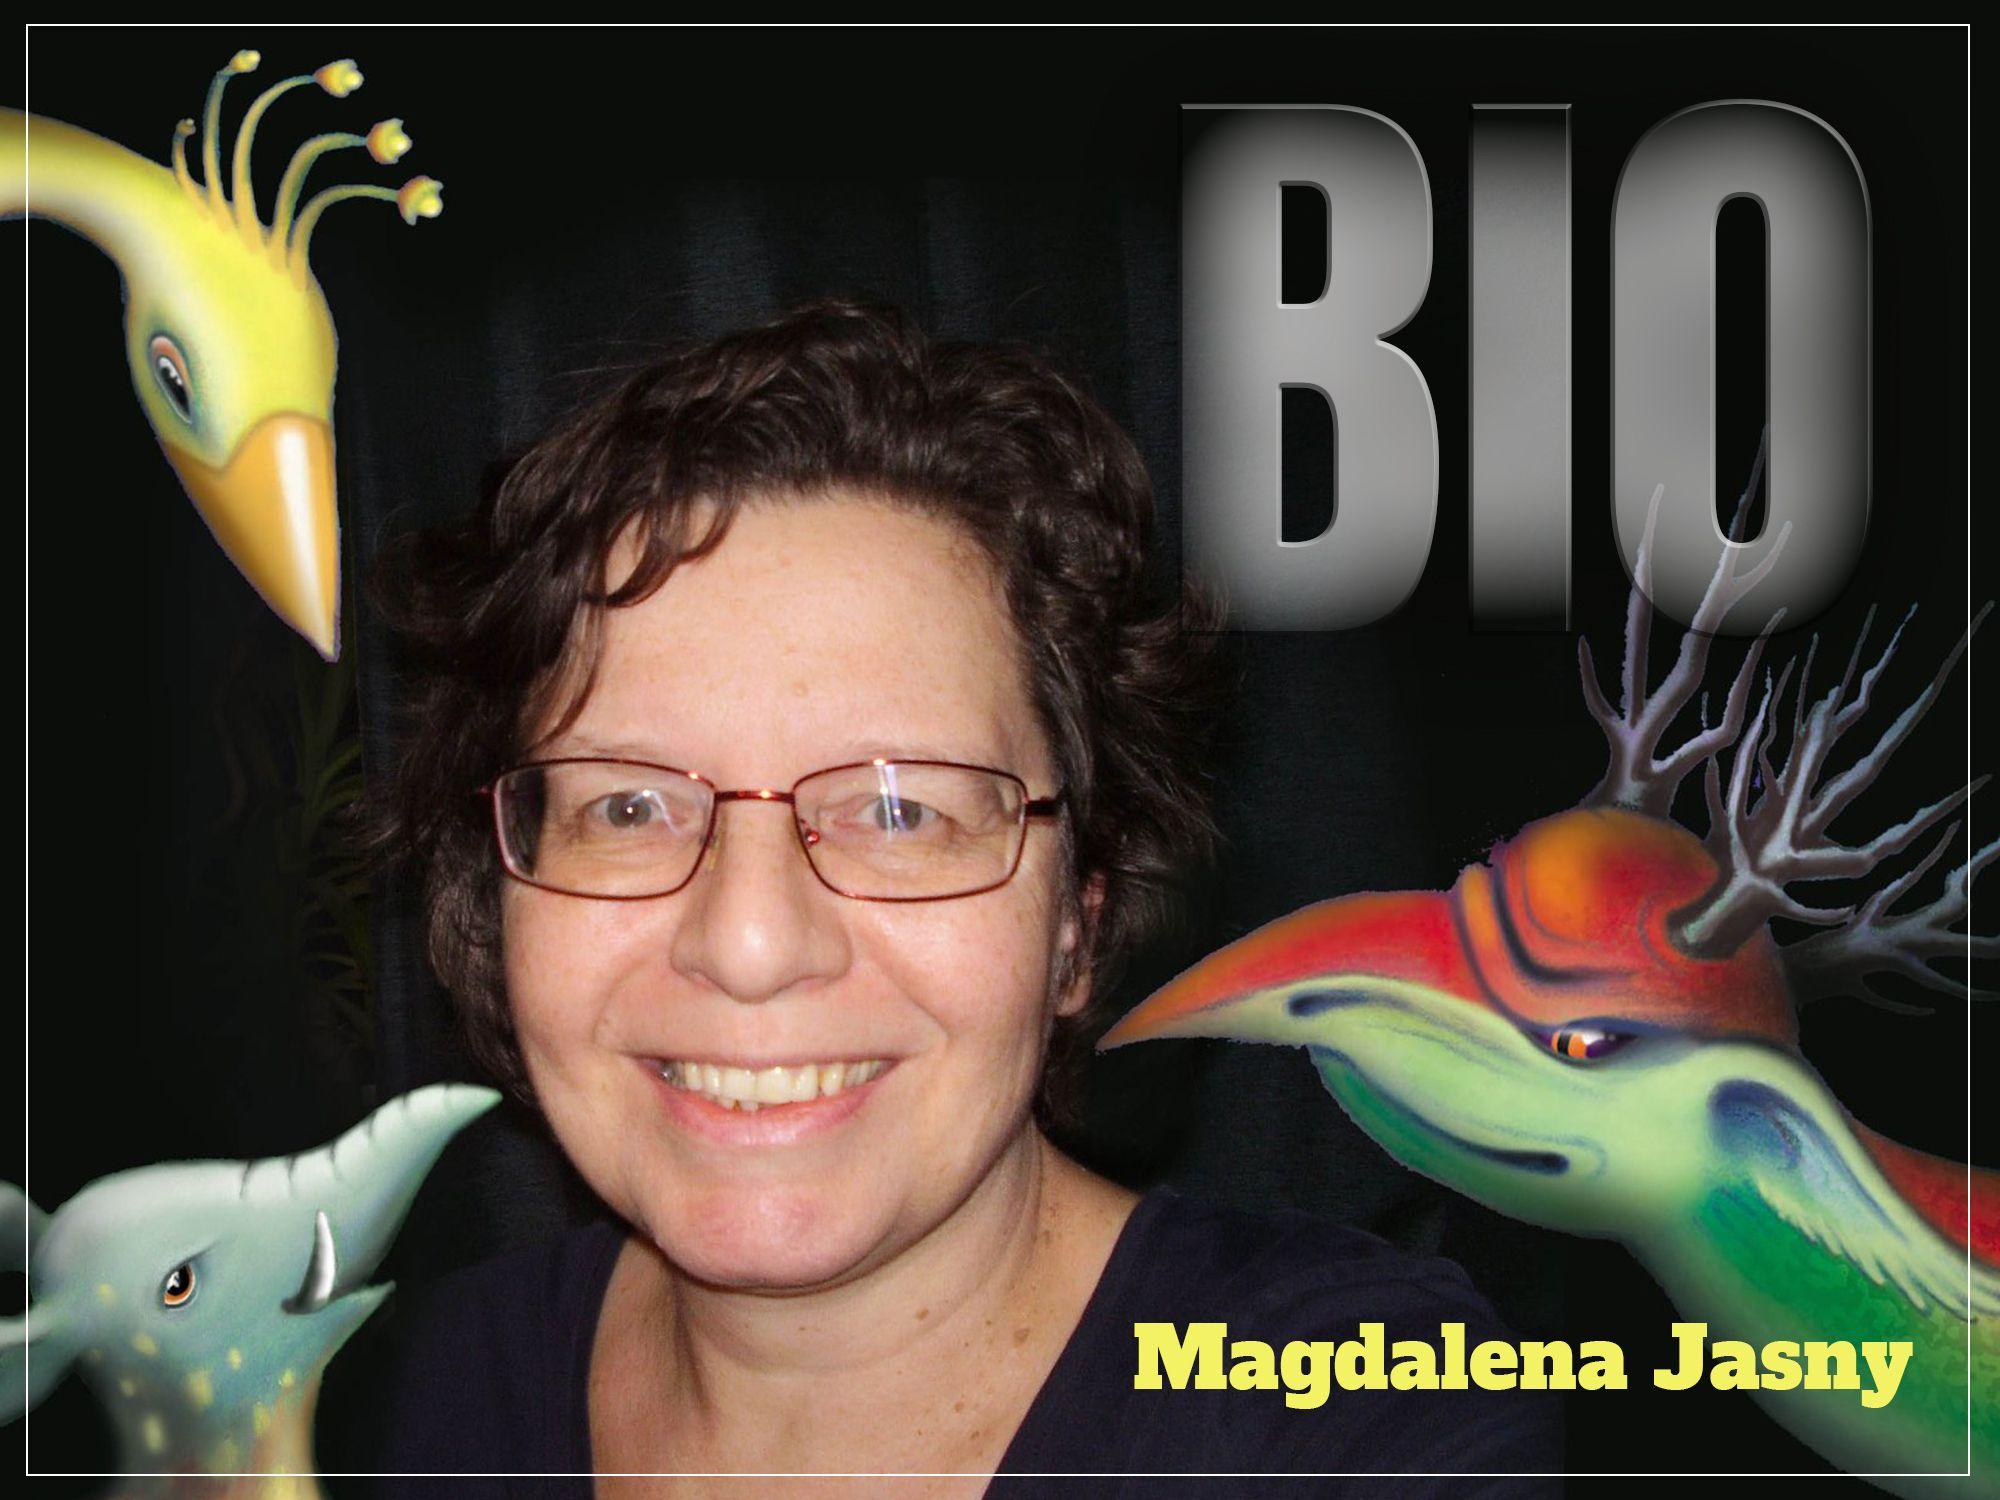 Magdalena Jasny